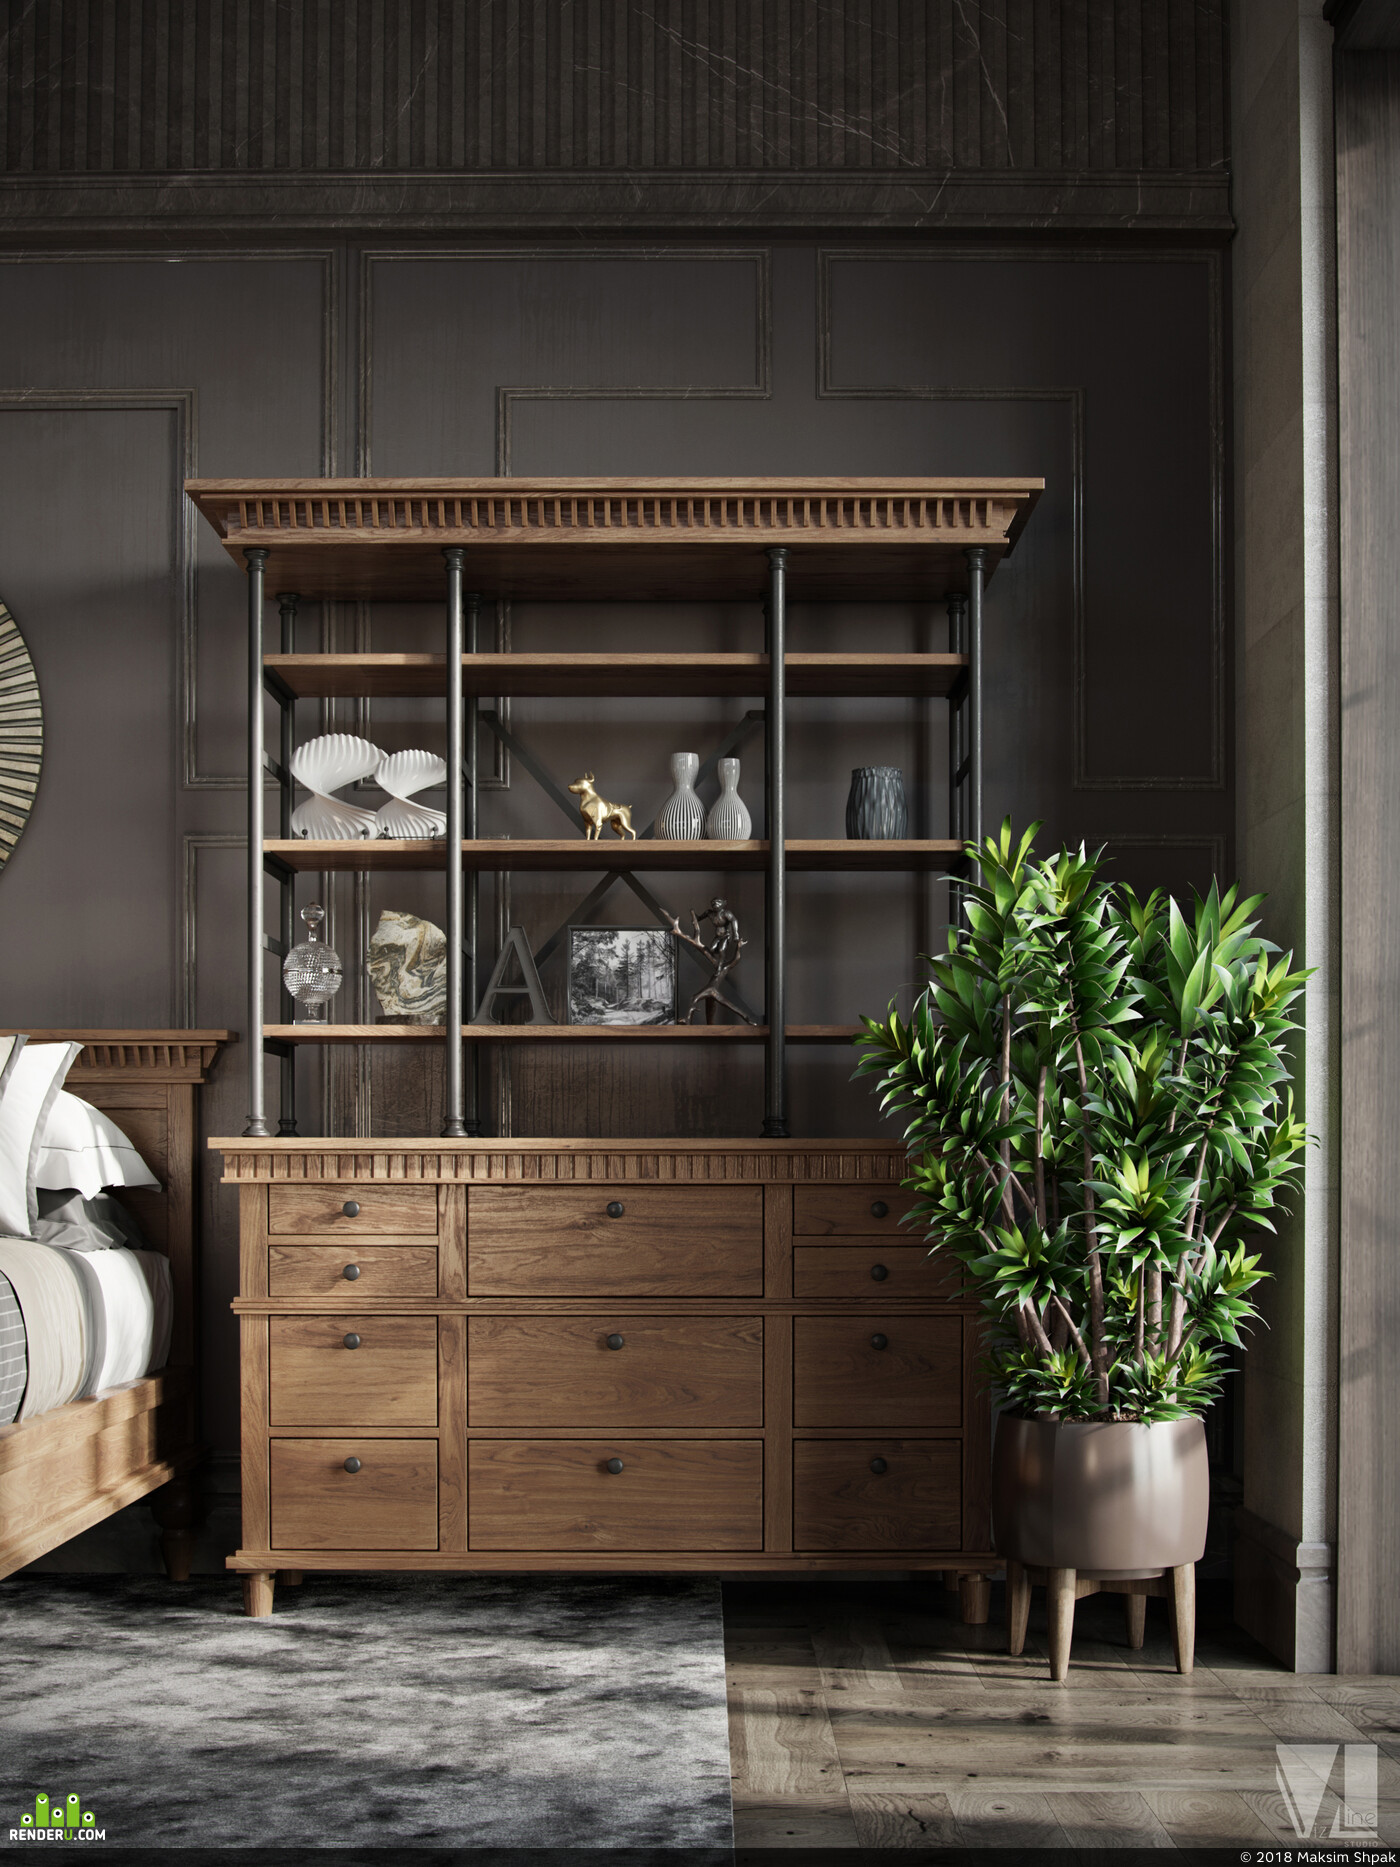 3dmax, Corona Renderer, Photoshop, vizlinestudio, дизайн интерьера, дизайн мебели, дизайн спальни, дизайн, Визуализация, лофт